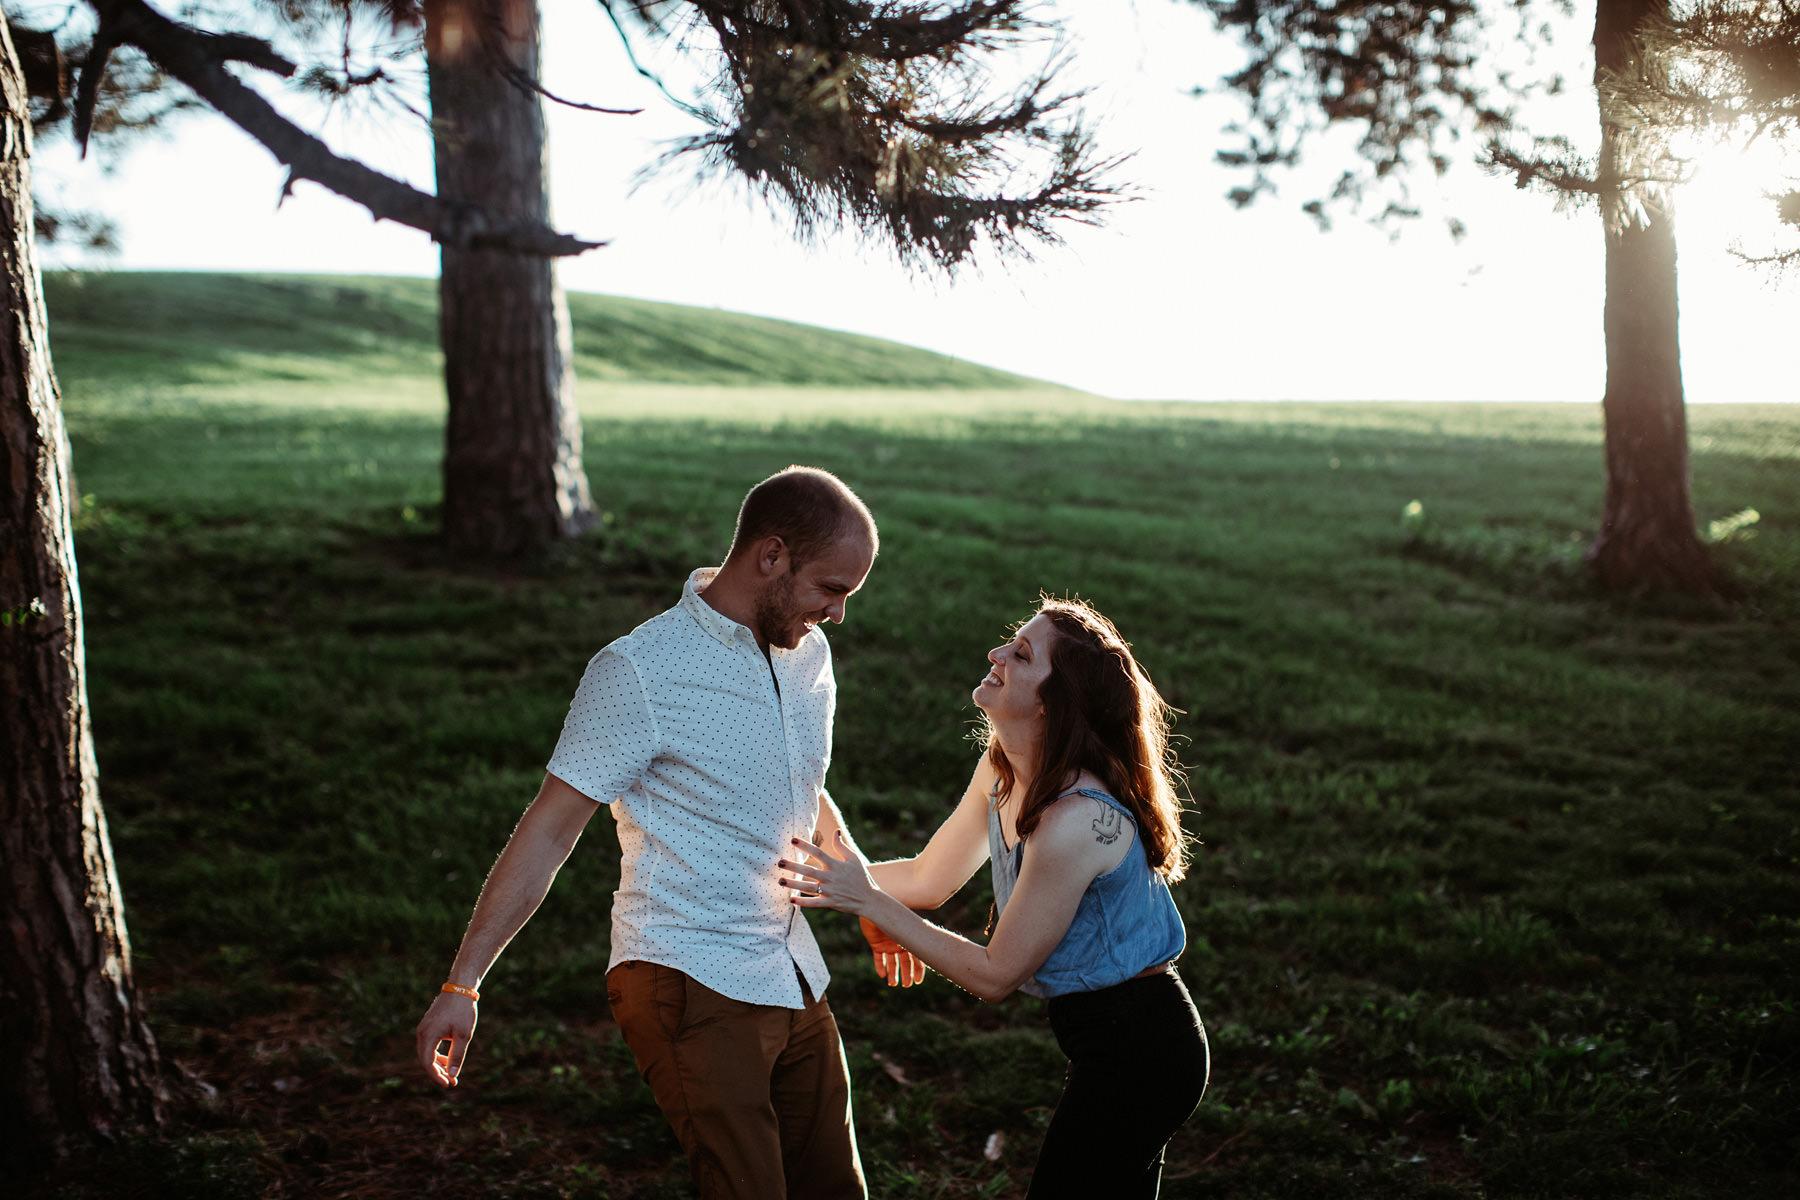 Kansas City_Penn Valley Park_Engagement Session_Kindling Wedding Photography07.JPG